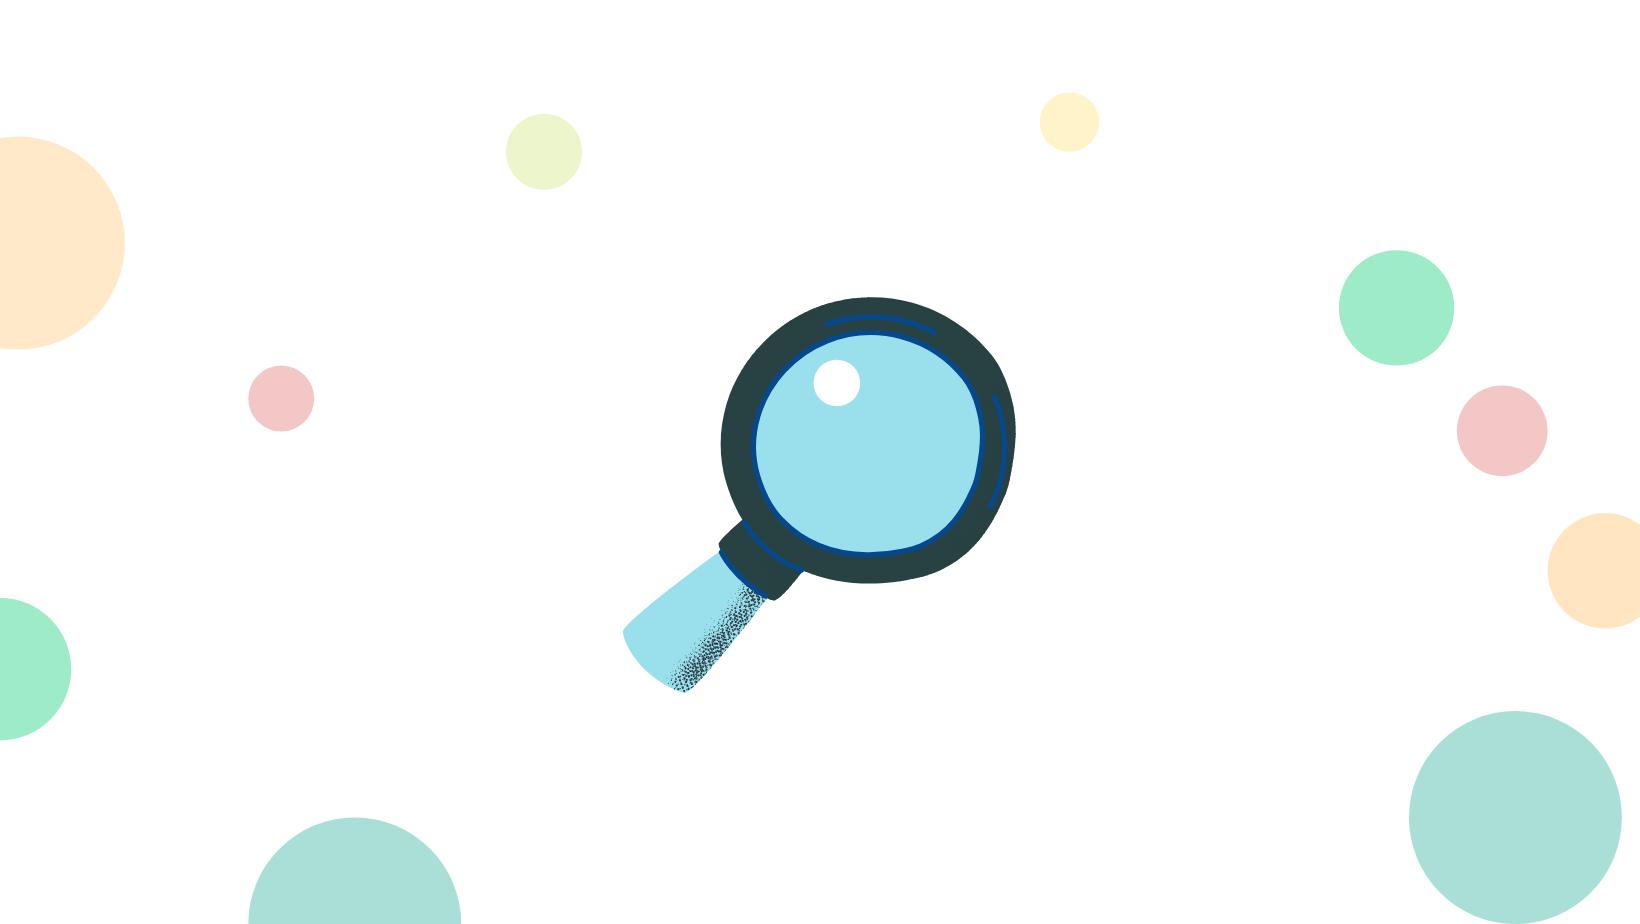 Exploratory Data Analysis with Python